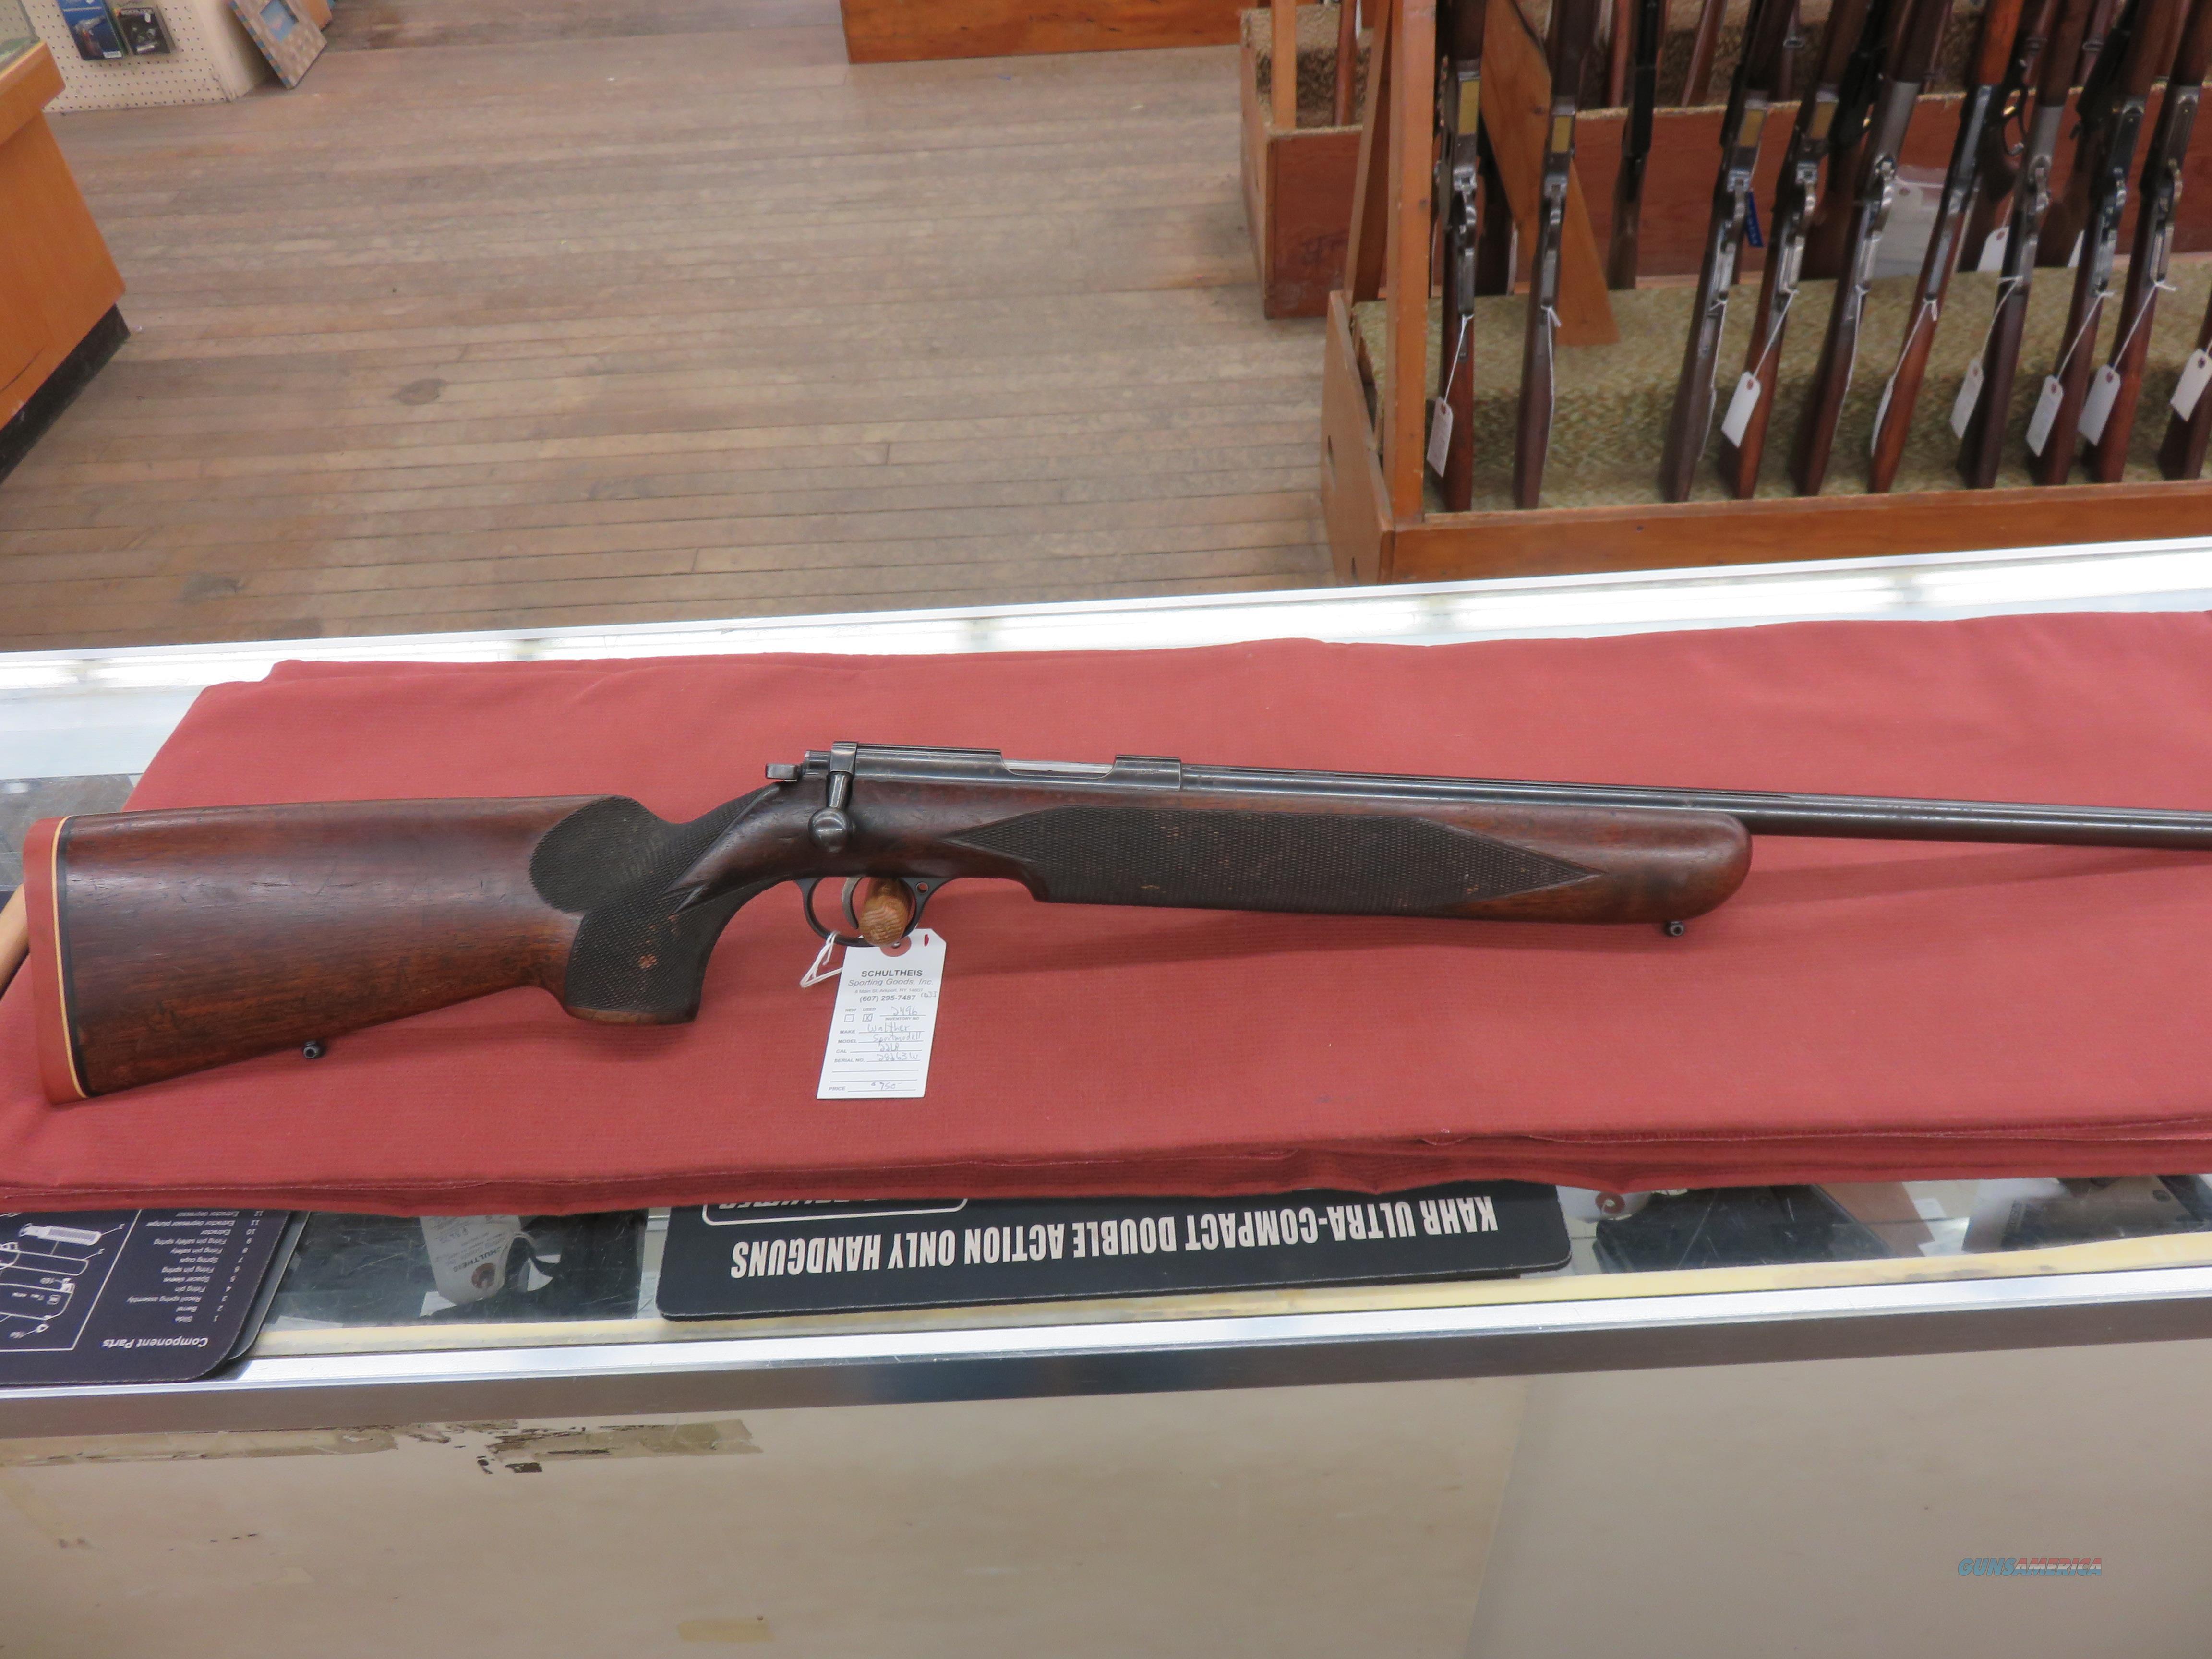 Walther Sportmodell Meisterbuchse  Guns > Rifles > Walther Rifles > Umarex